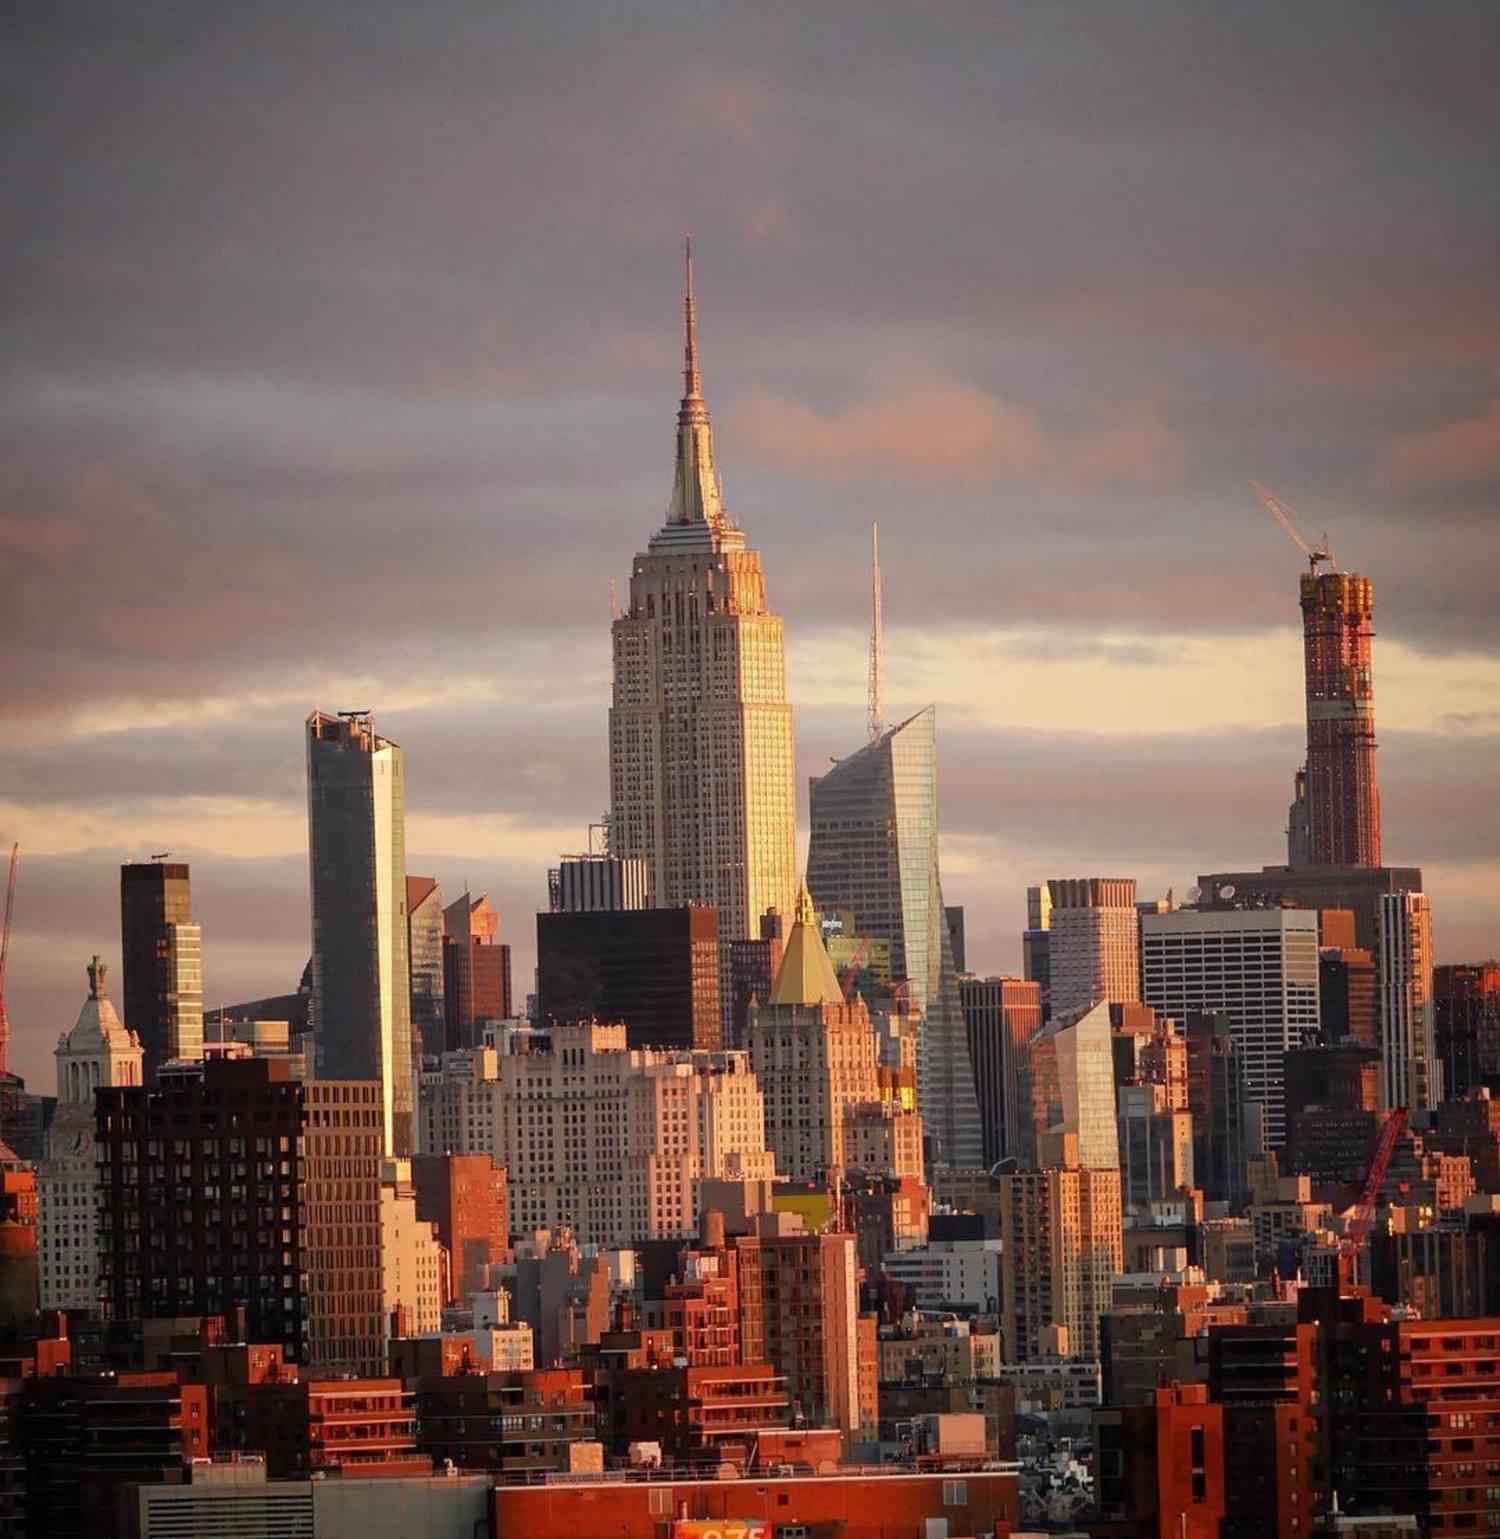 New York, New York. Photo via @bklyn_block #viewingnyc #nuc #newyork #newyorkcity